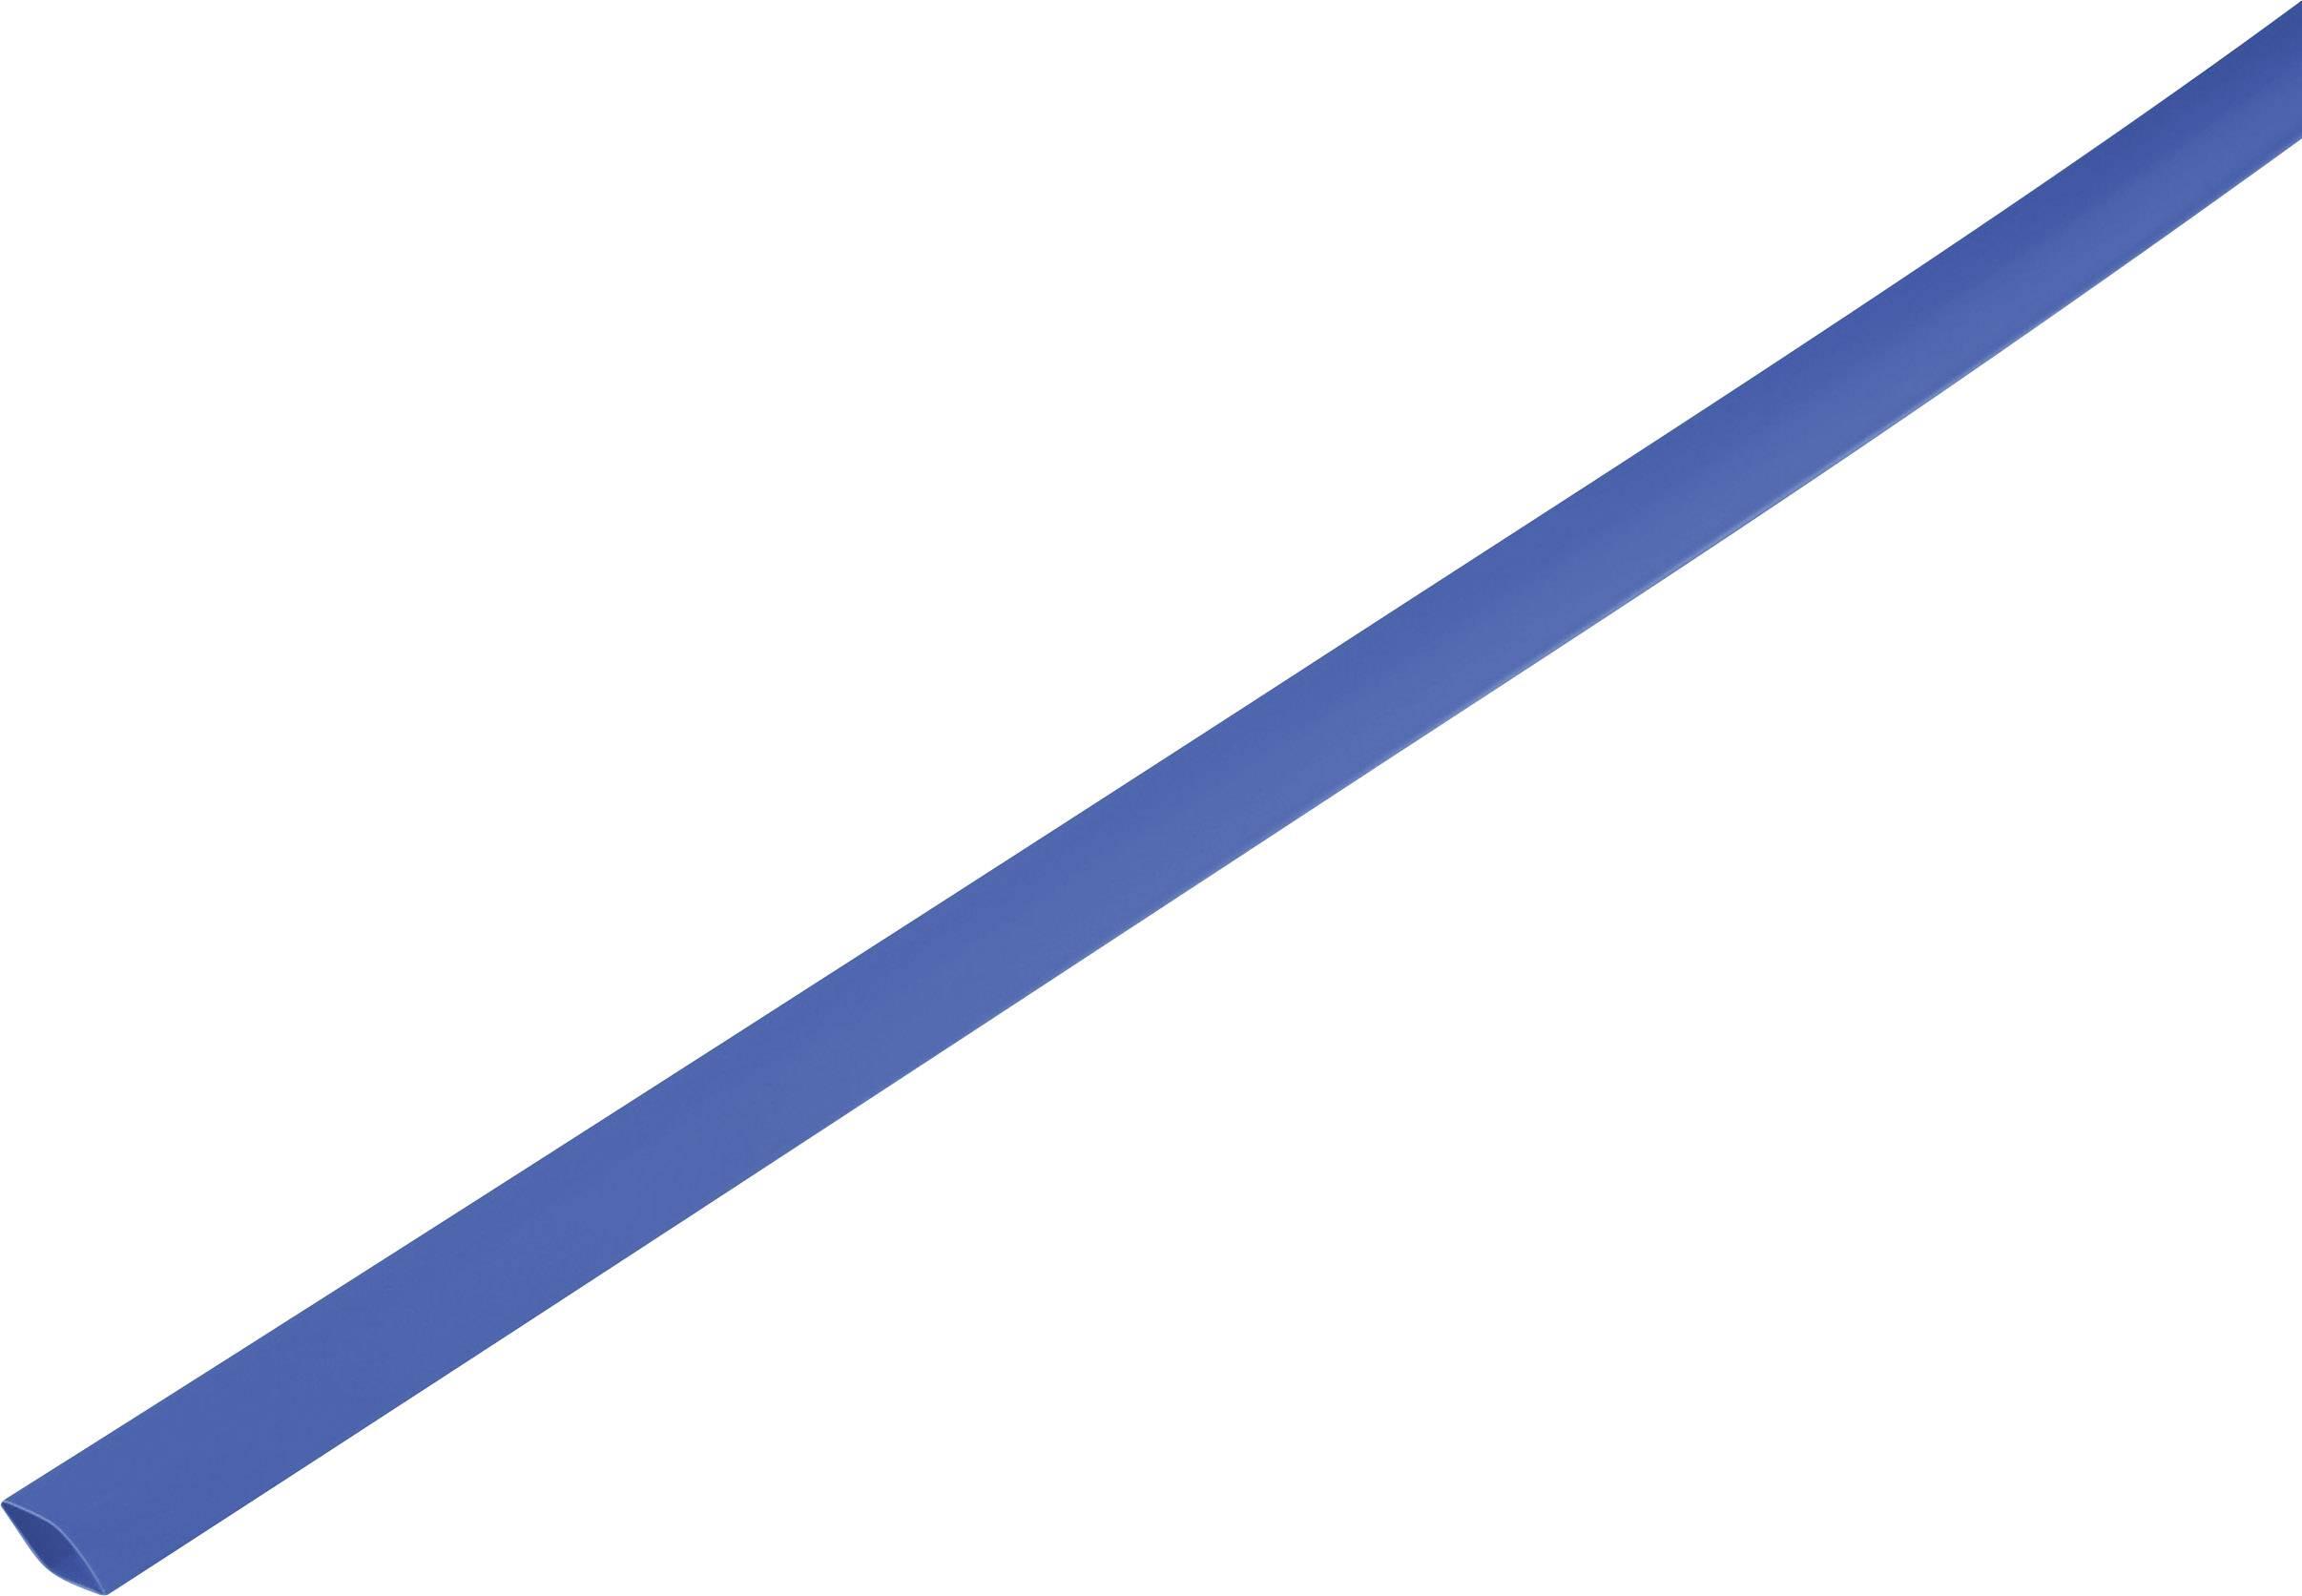 Bleu 12 mm Gaine Thermo Rétractable 2:1 1m Diam